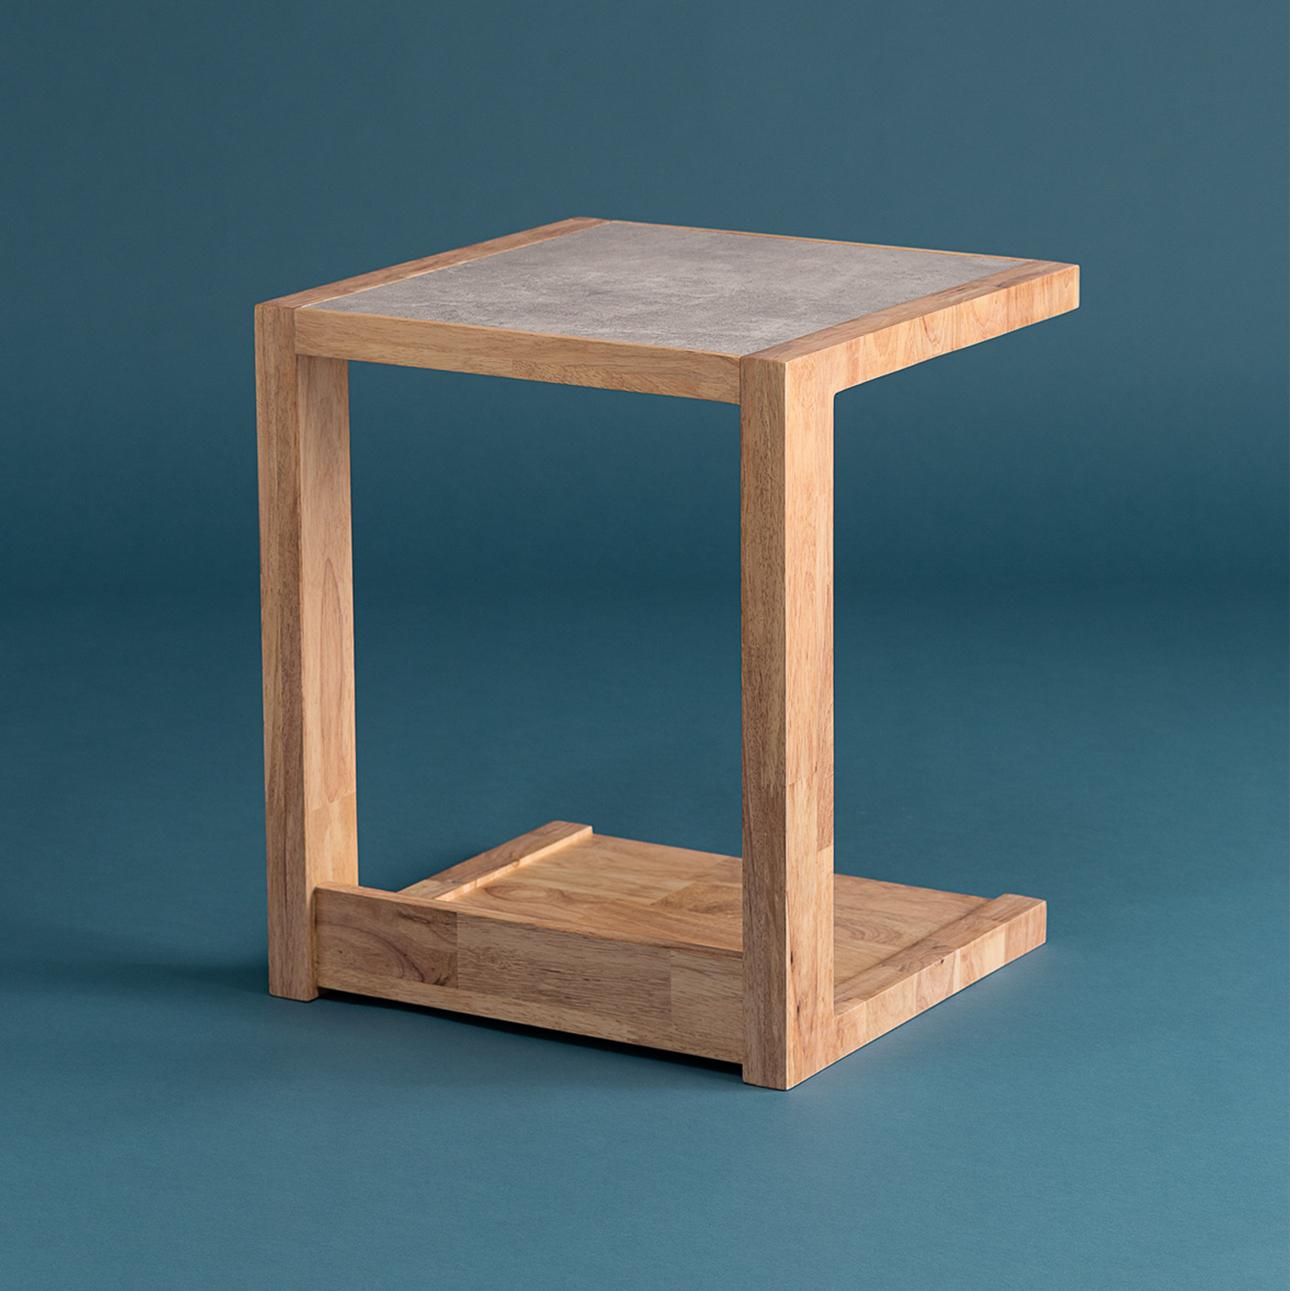 mayc-table-2.jpg